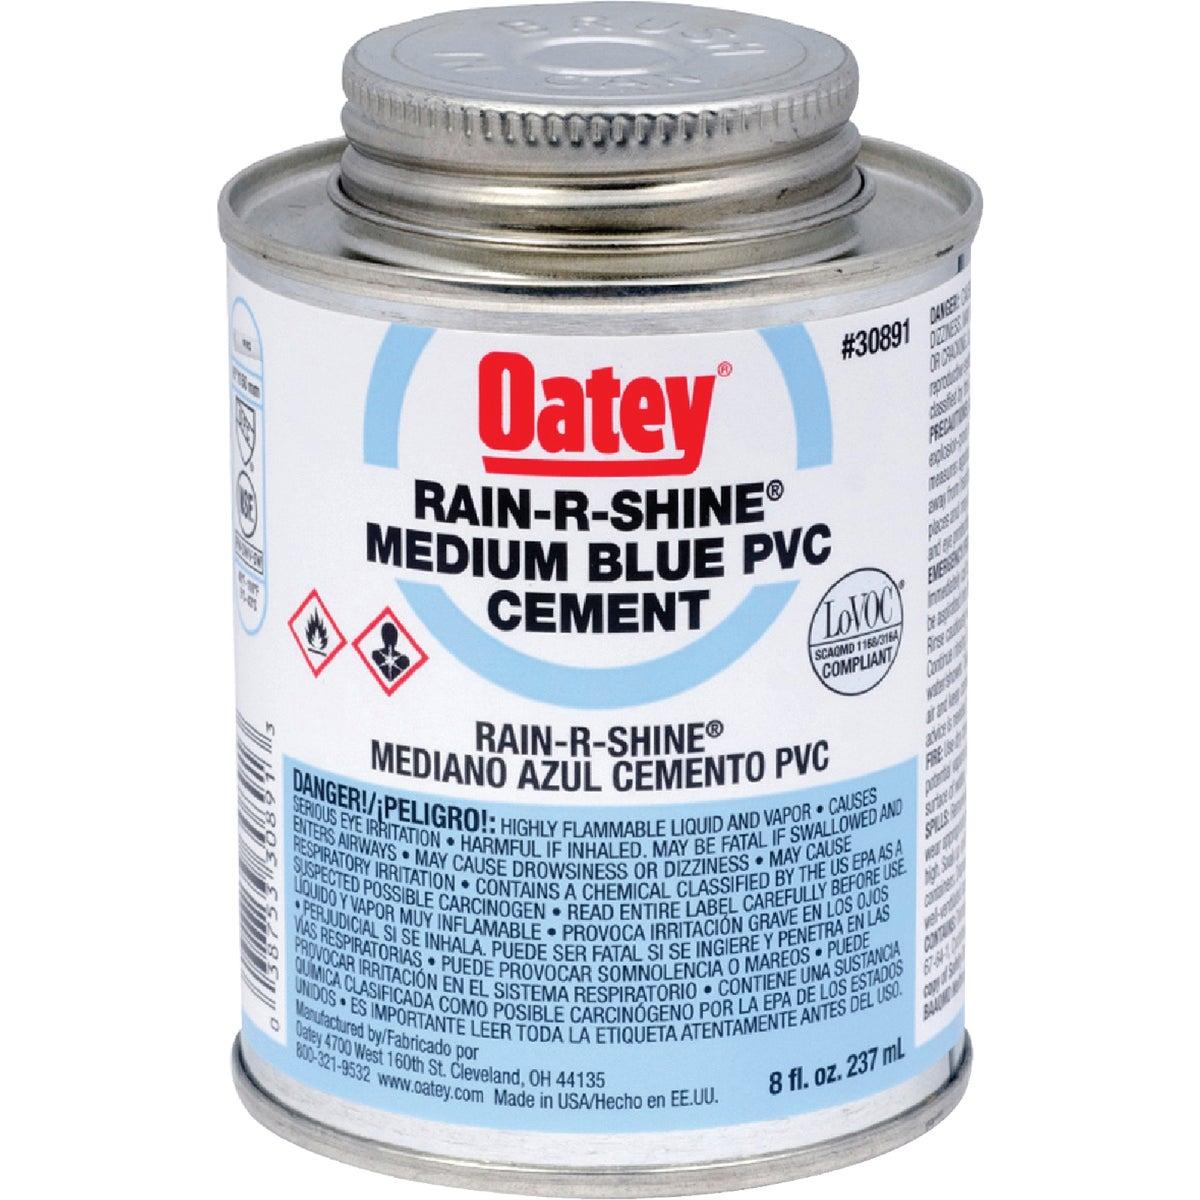 1/2PINT WET PVC CEMENT - 30891 by Oatey Scs